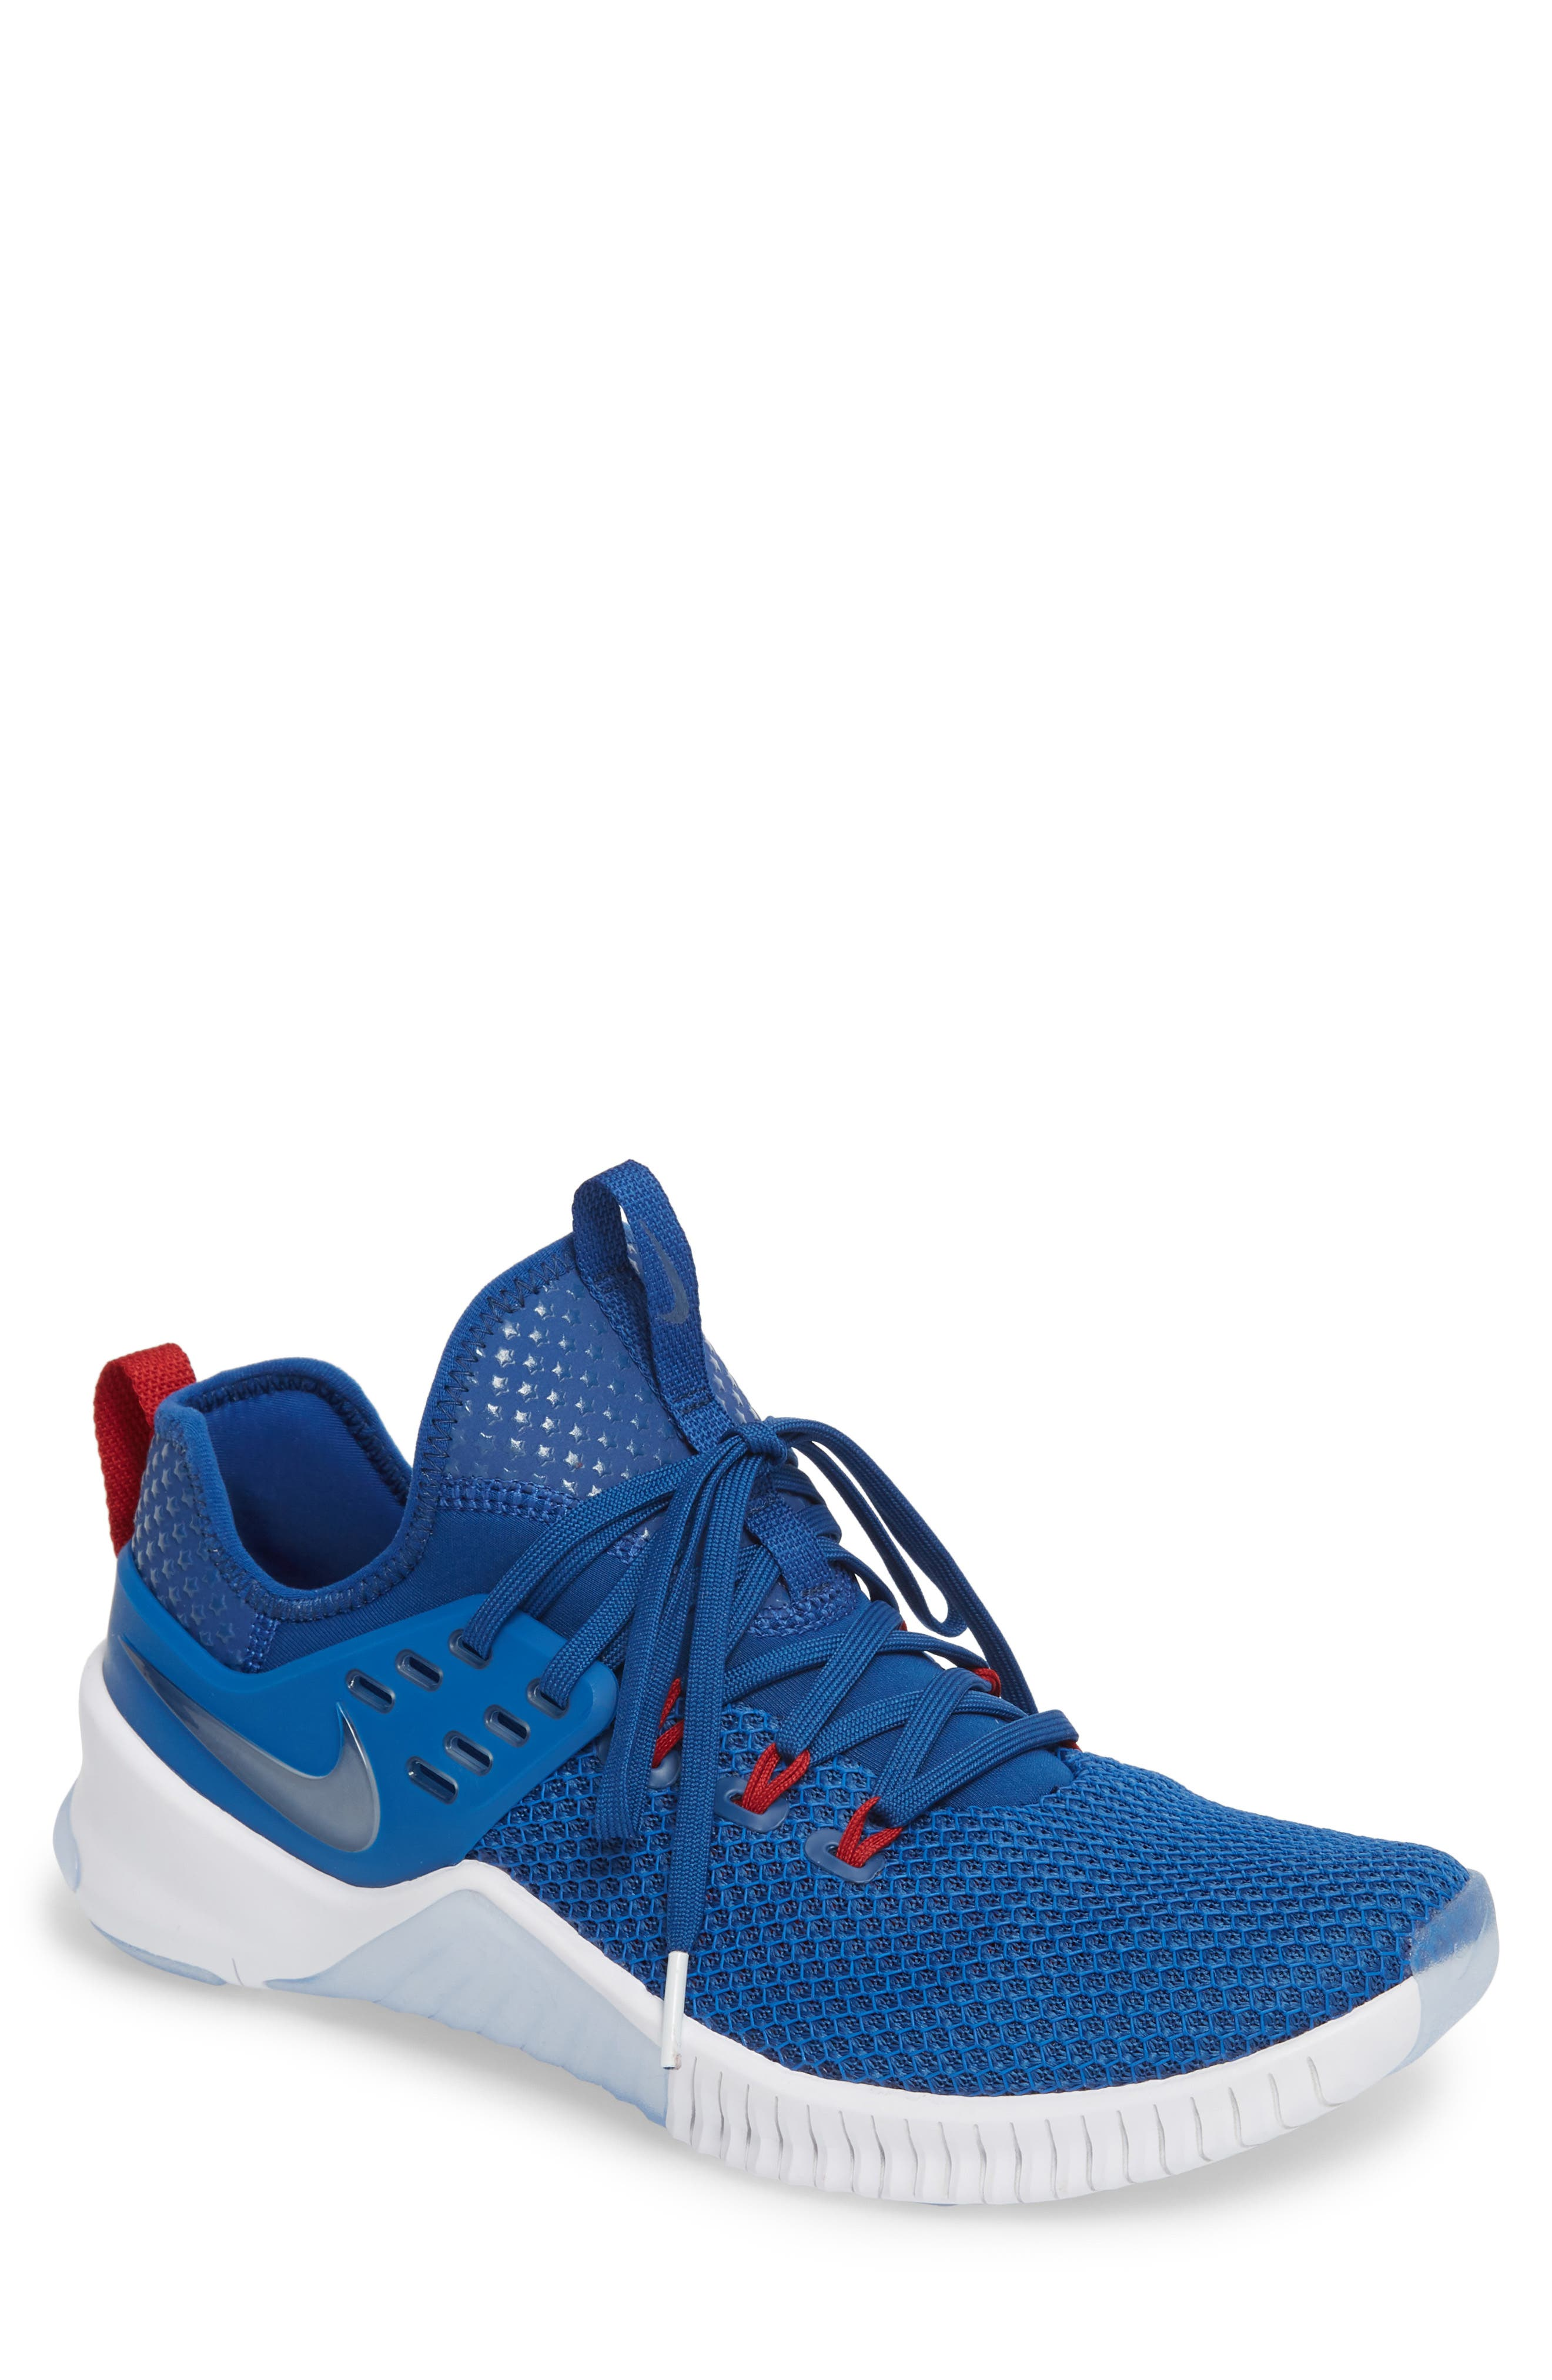 x metcon americana training shoes